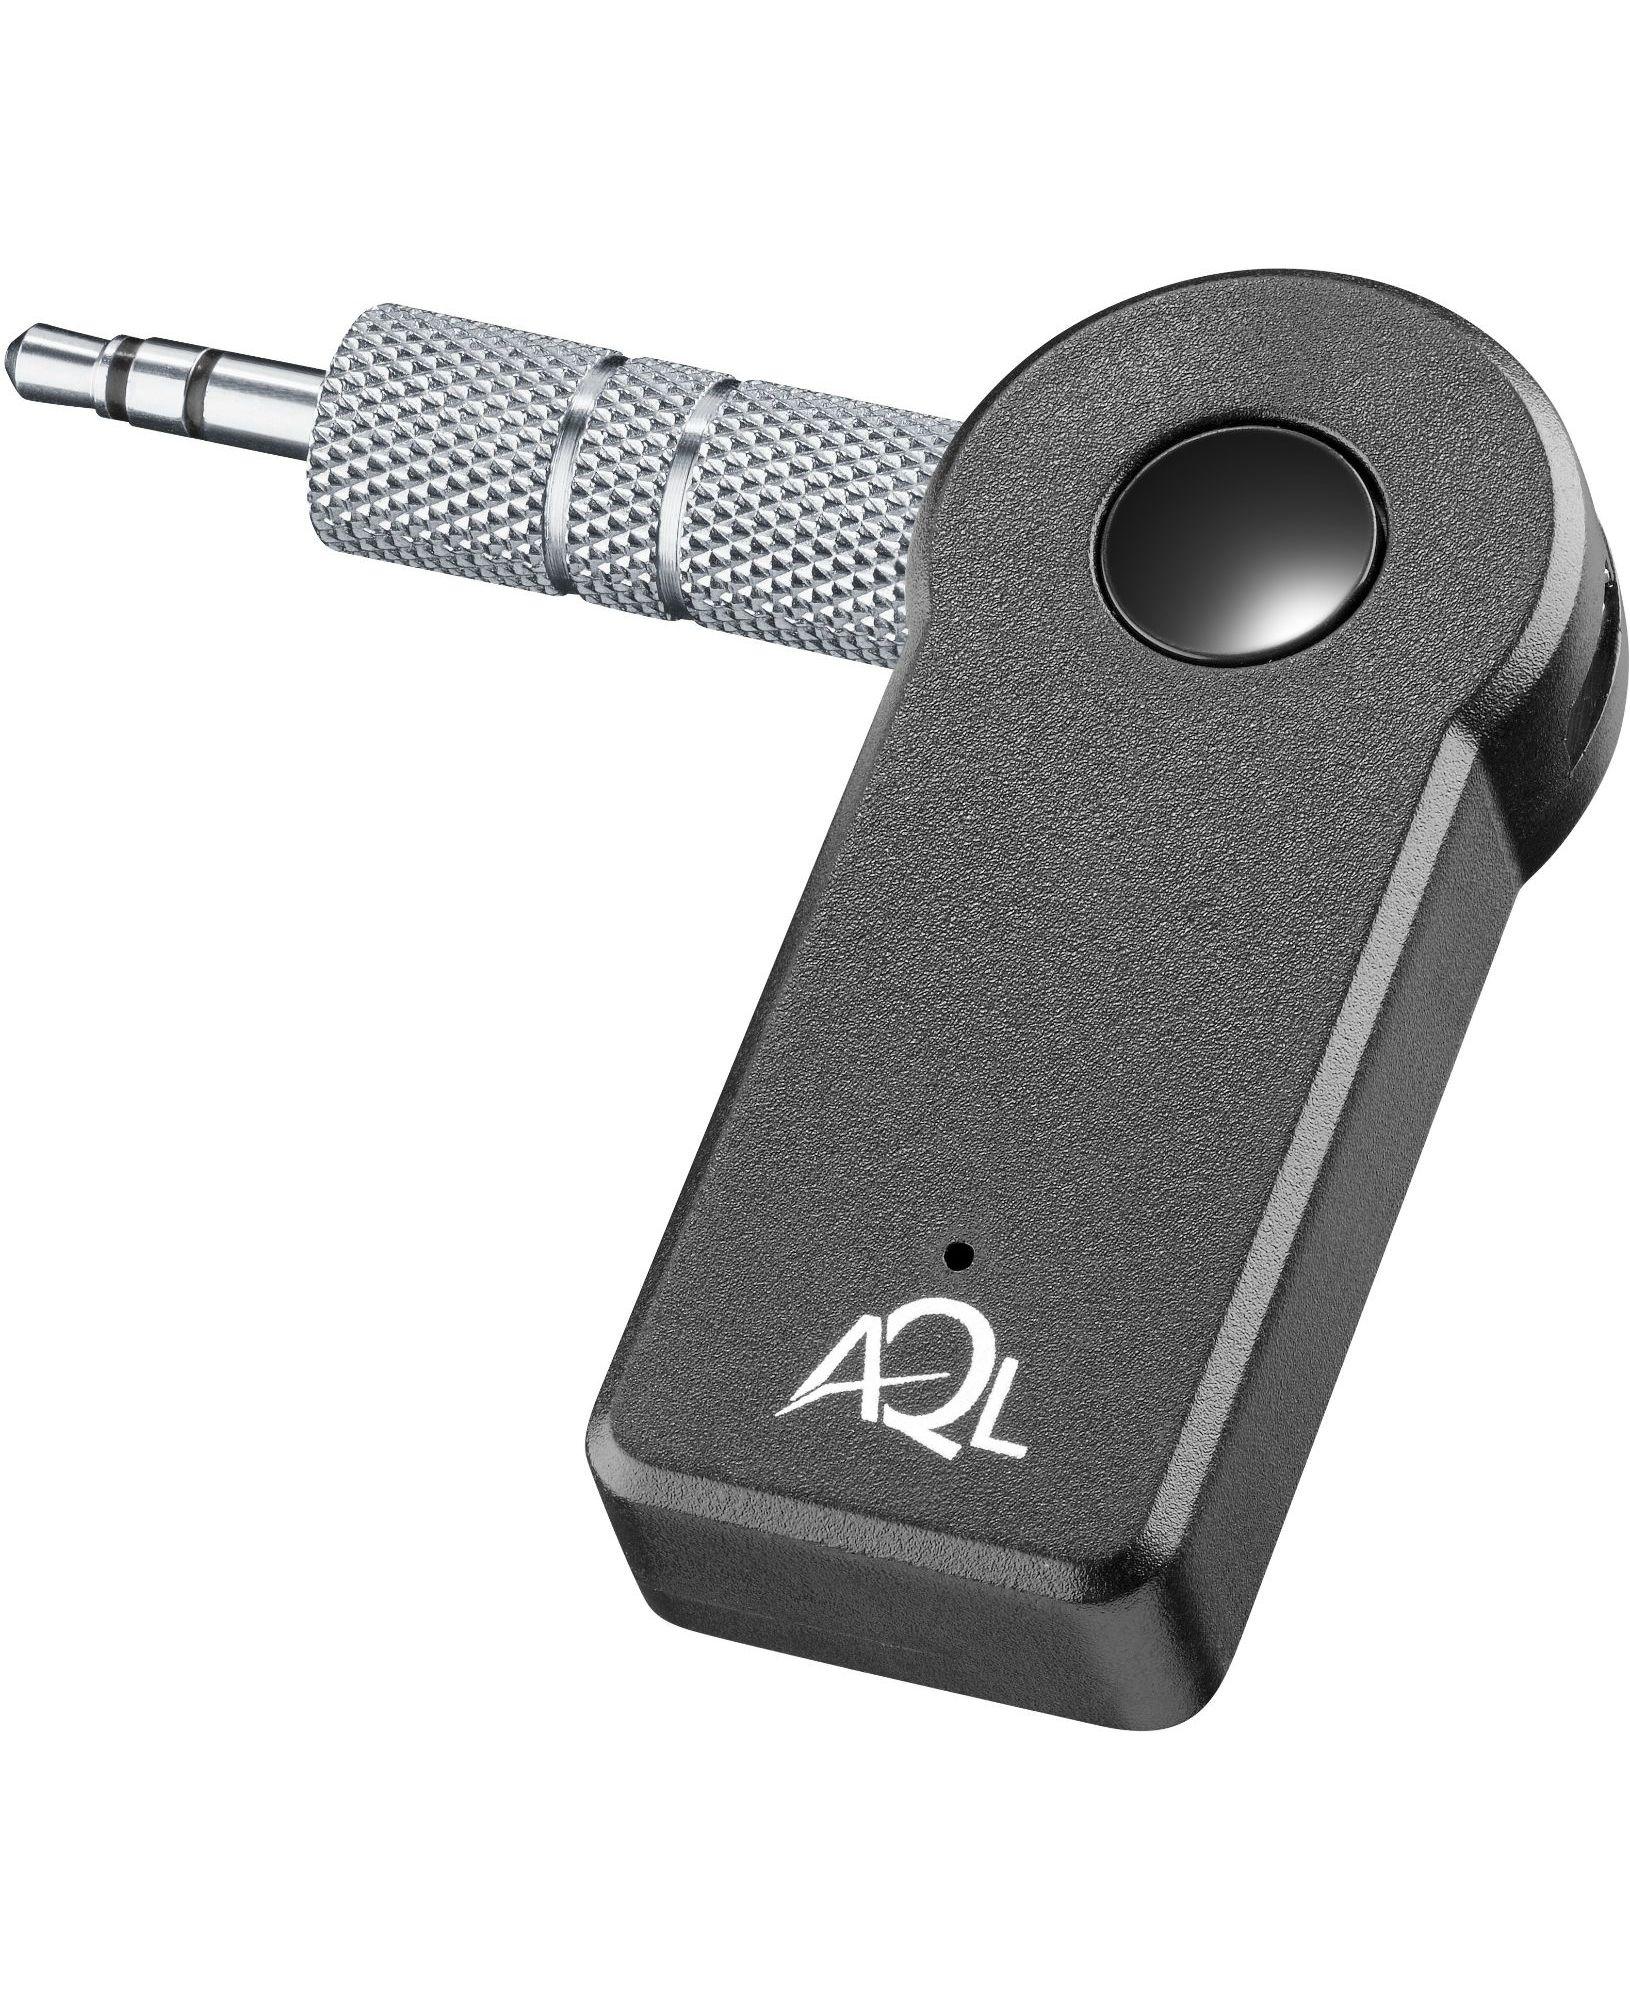 Cellularline AUDIO RECEIVER - UNIVERSALE Bluetooth Receiver